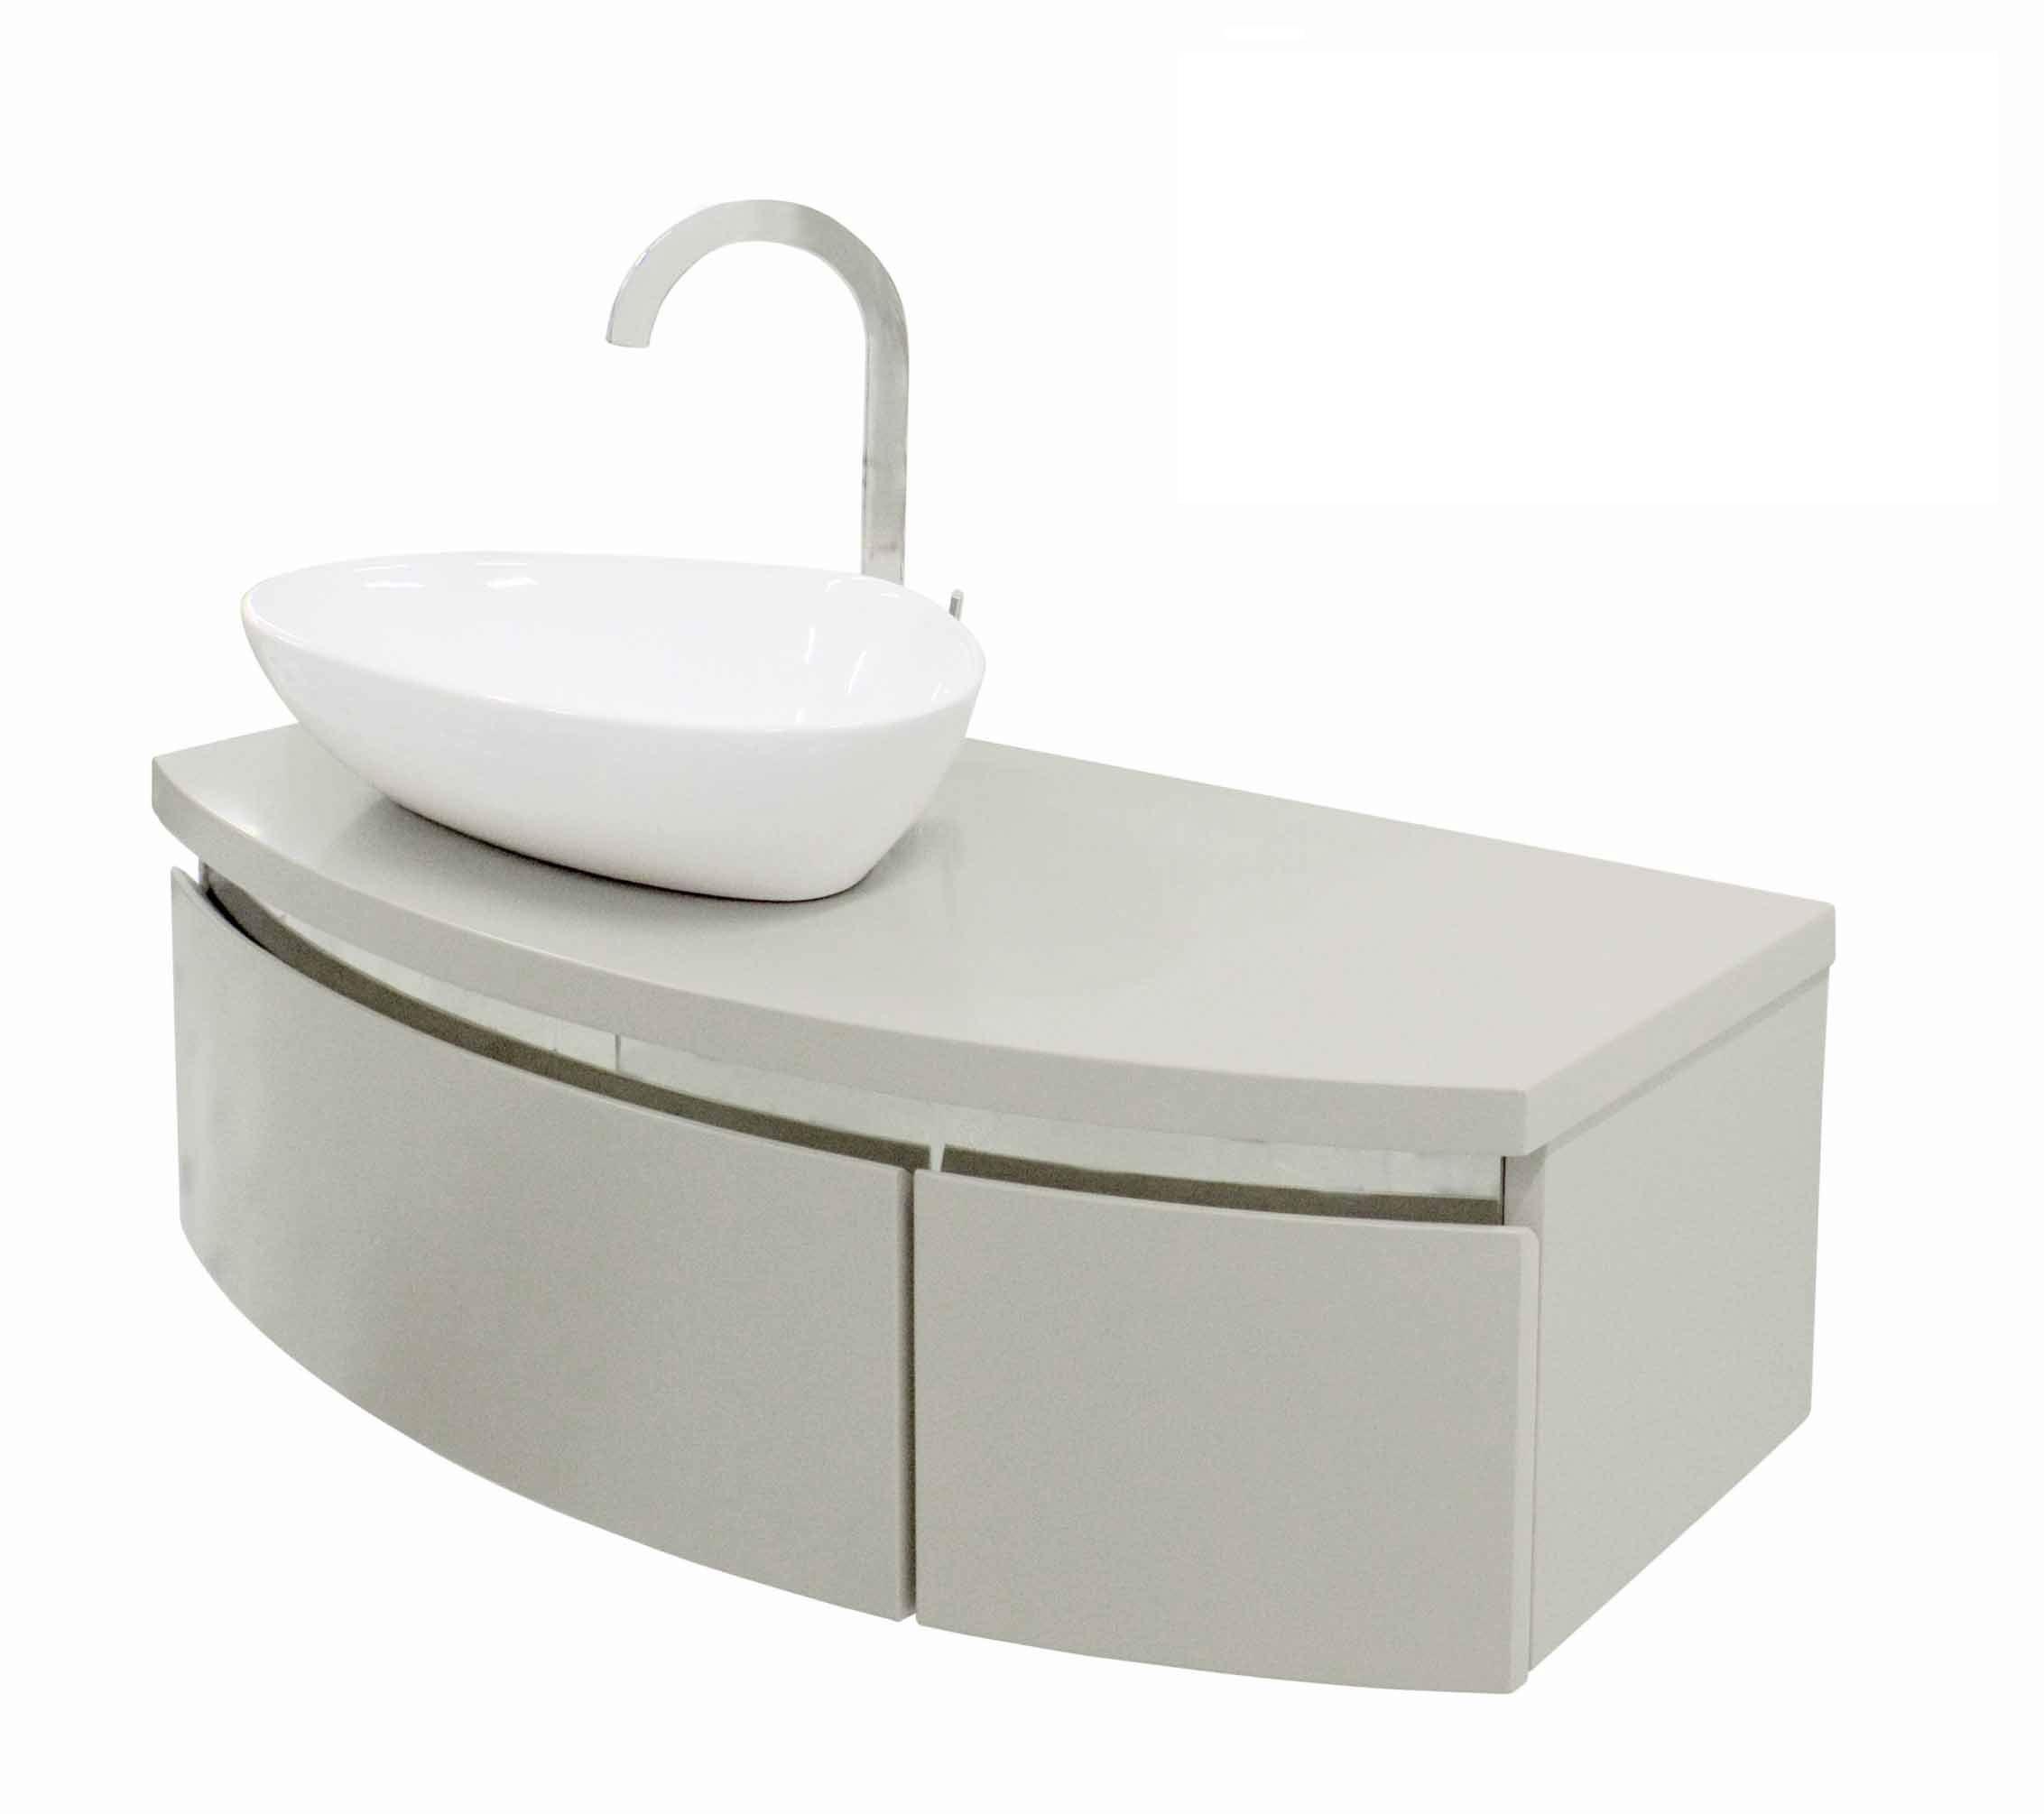 Mobile da bagno sospeso brigitte pratiko store for Pianeta casa mobili